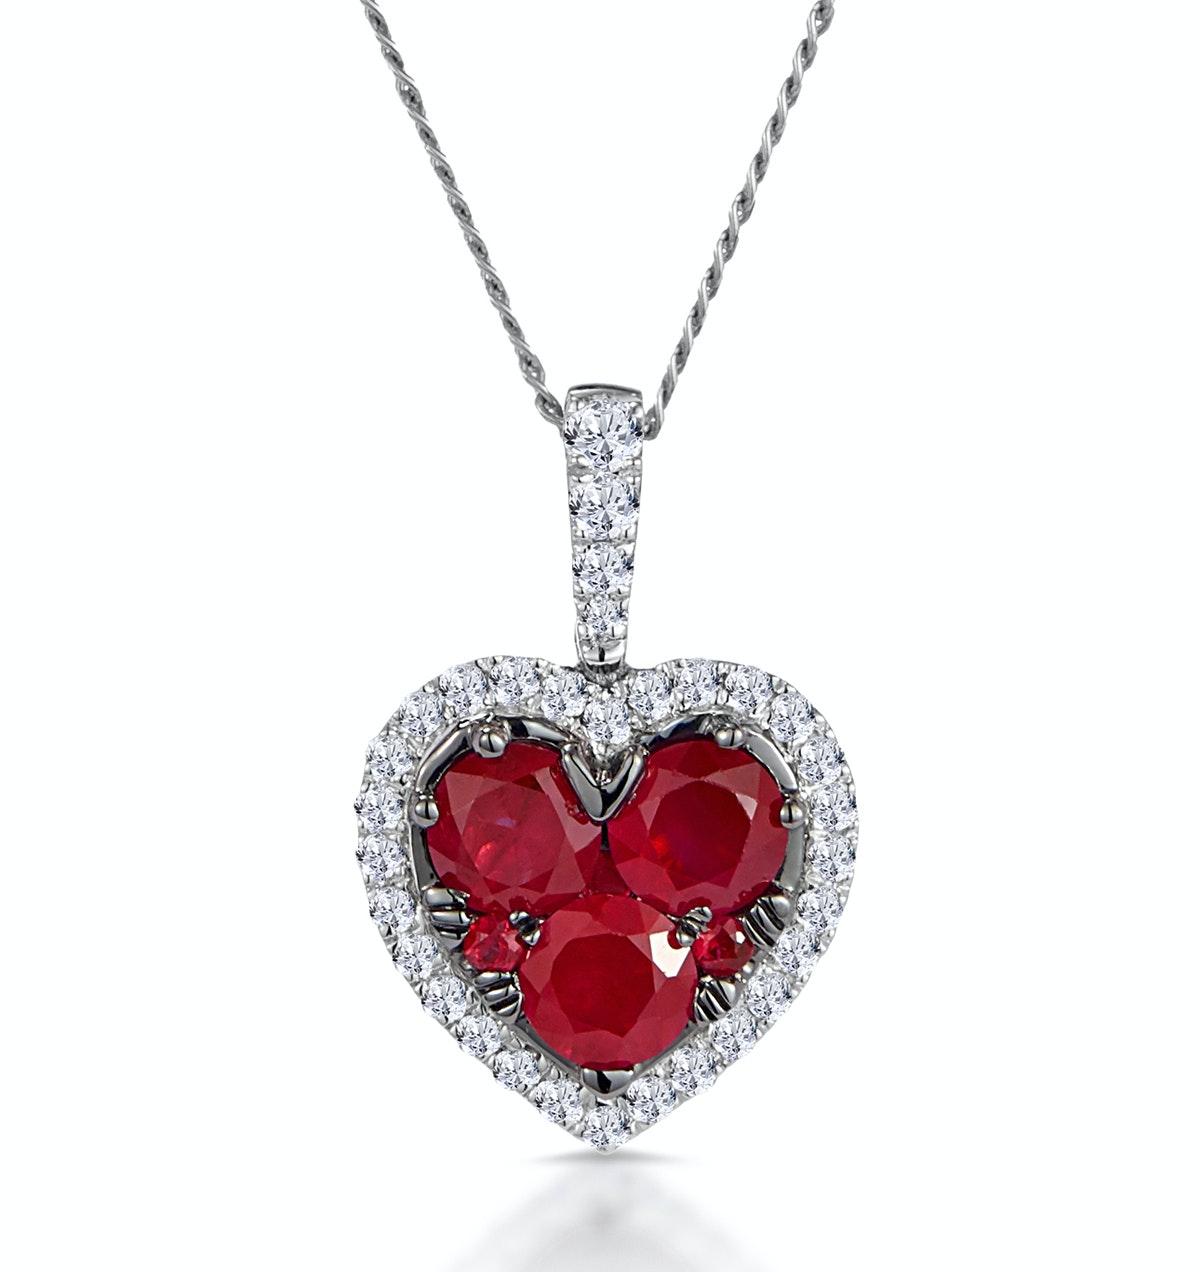 0.80ct Ruby Asteria Diamond Heart Pendant in 18K White Gold